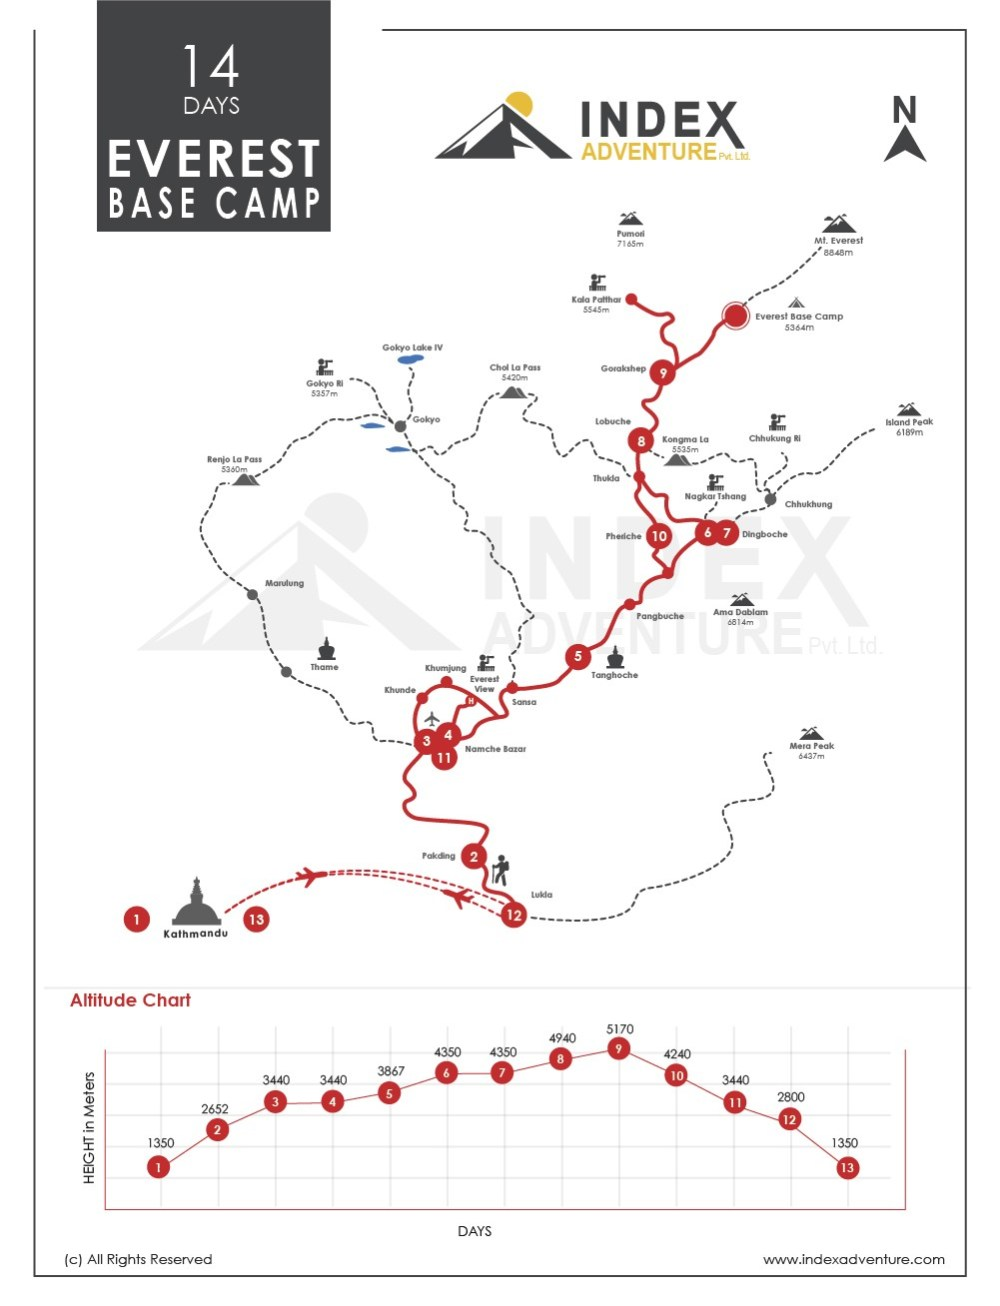 medium resolution of 14 days everest base camp trek map